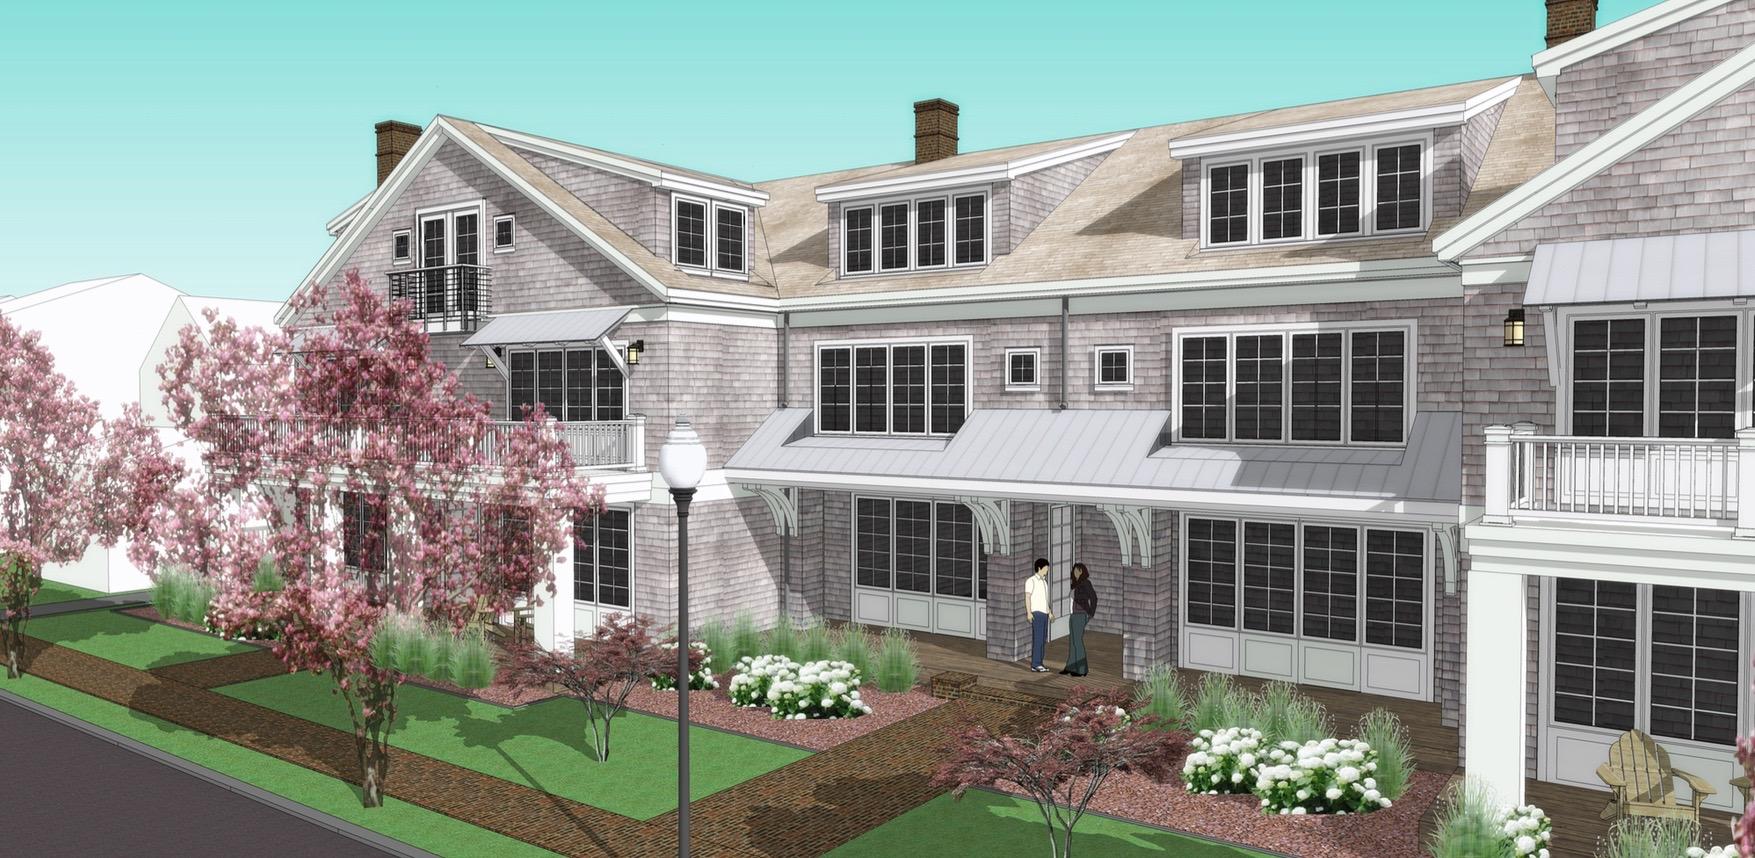 Townhome-like residences along Chesapeake Avenue